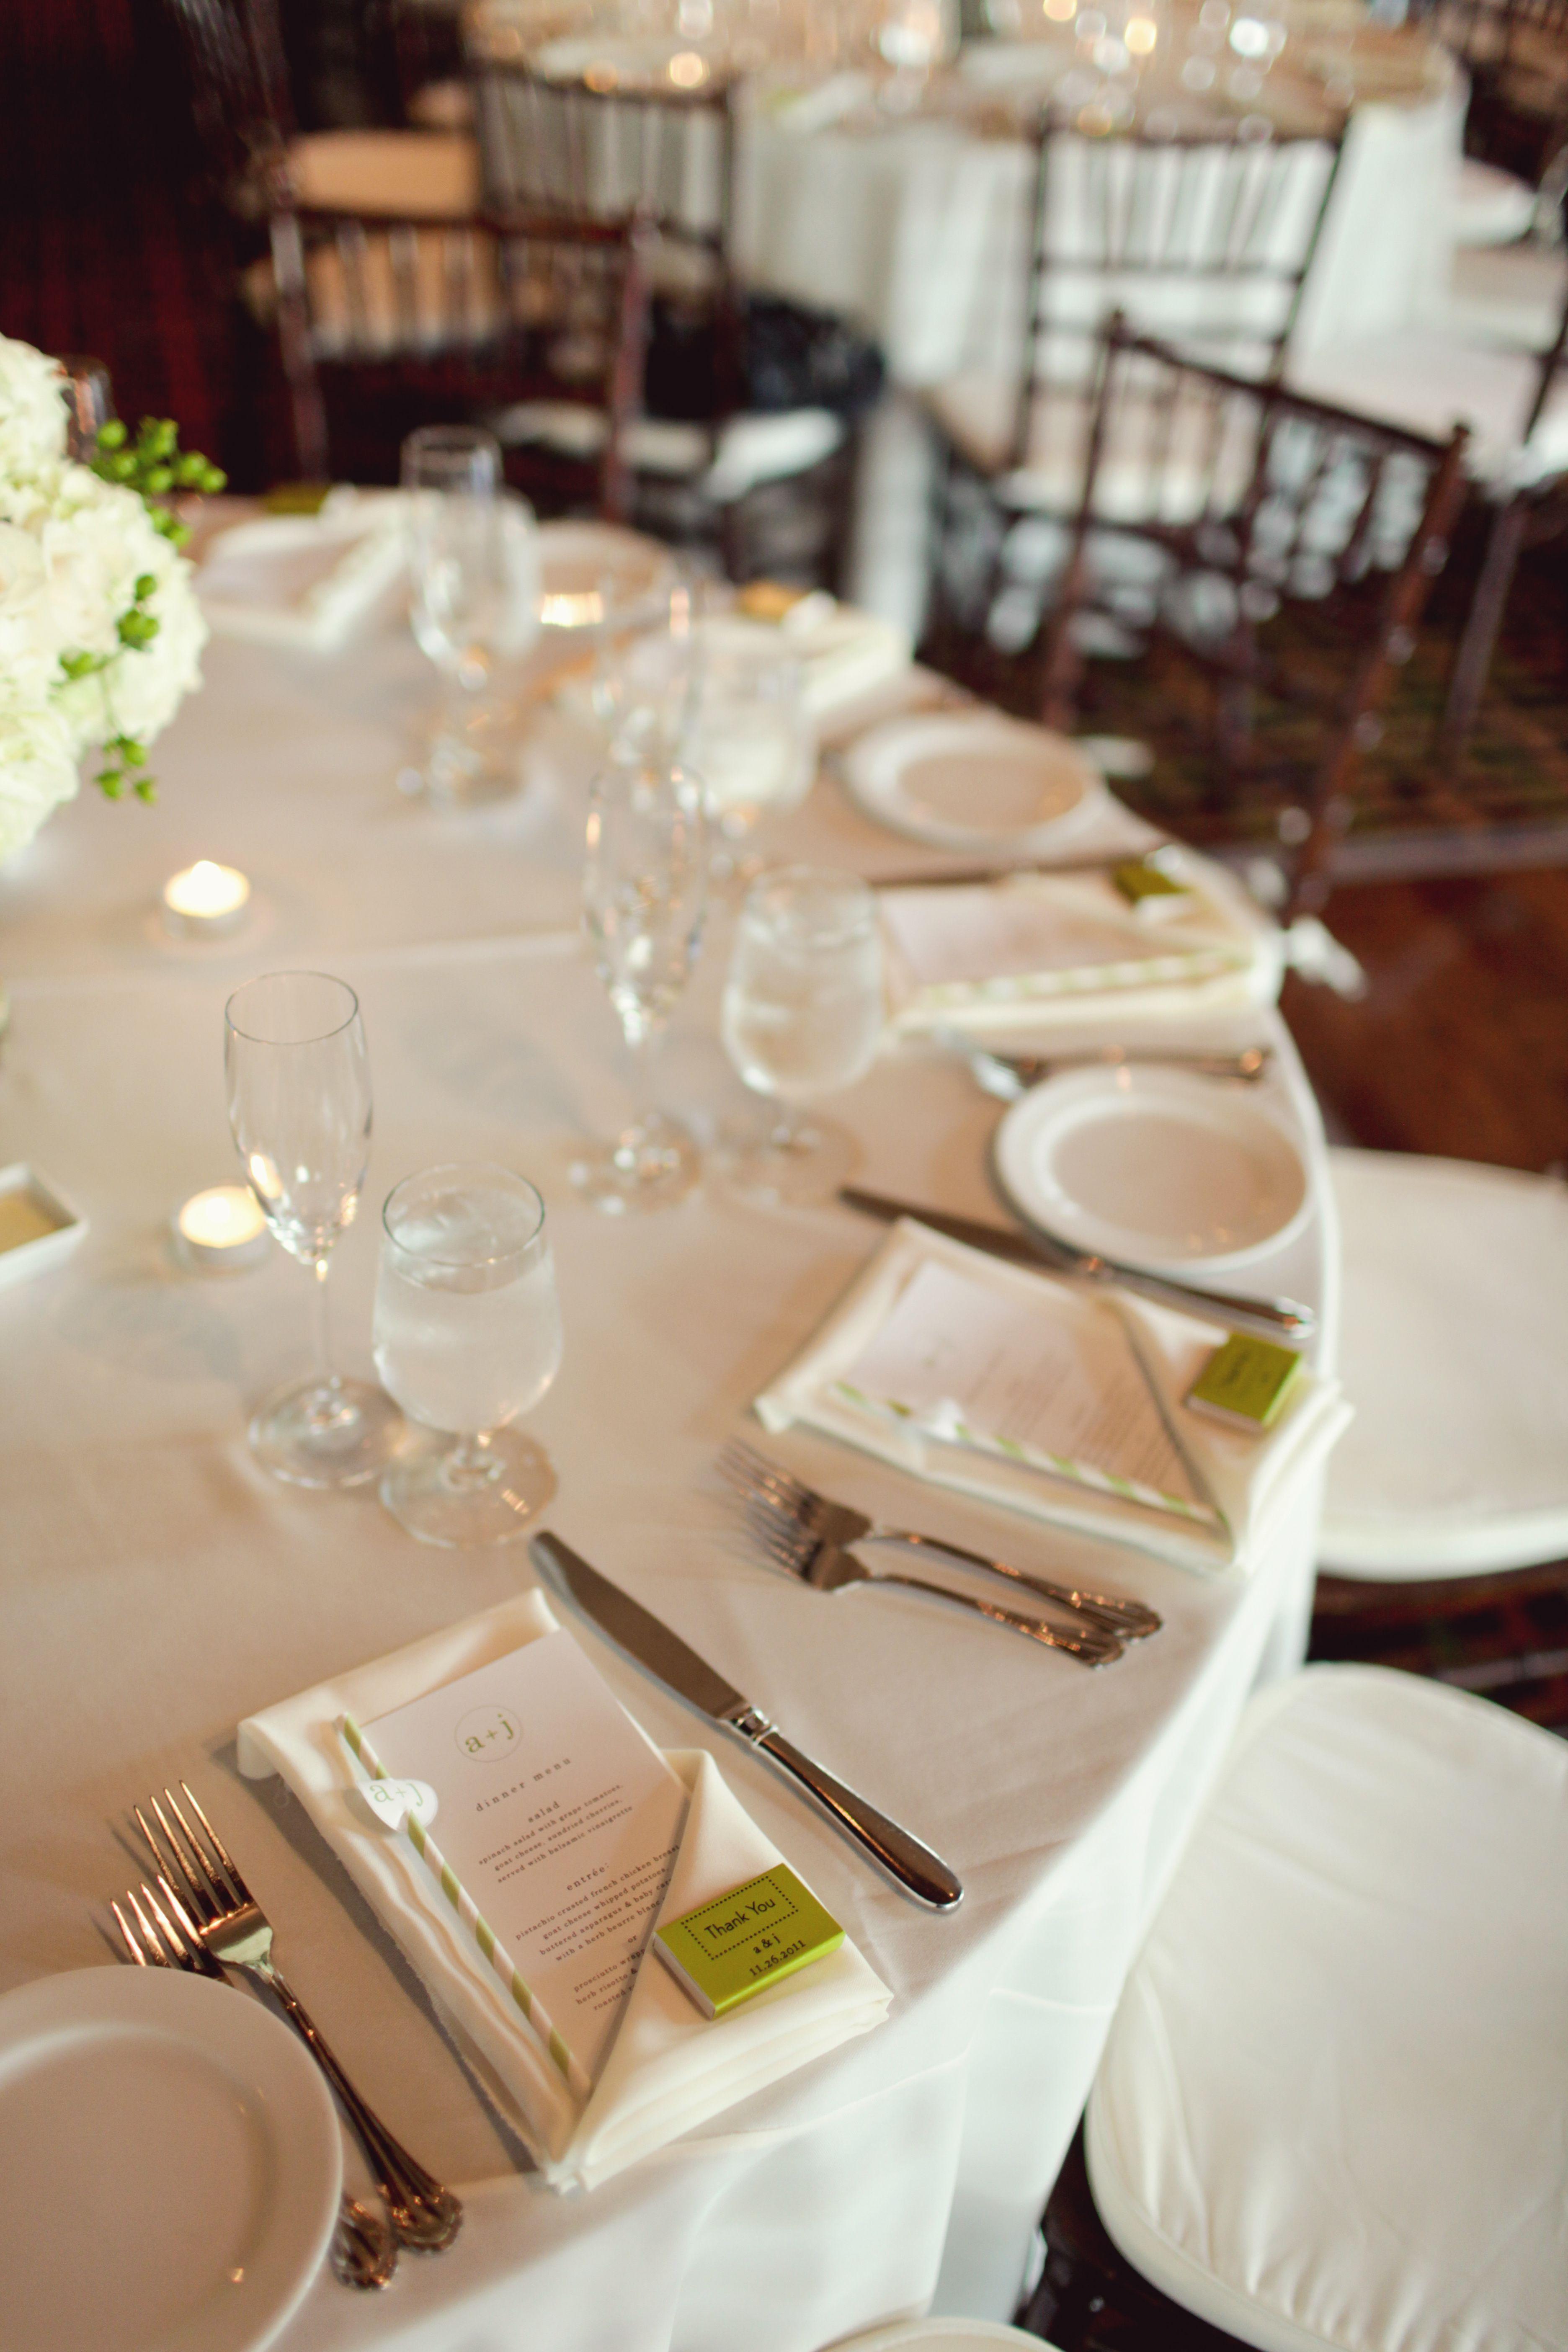 John and Angela's Wedding at Aliso Viejo Country Club.  #alisoviejowedding #california #alisoviejo #orangecounty #white #weddingdecoration #weddingtable  #reception #whiteandgreen